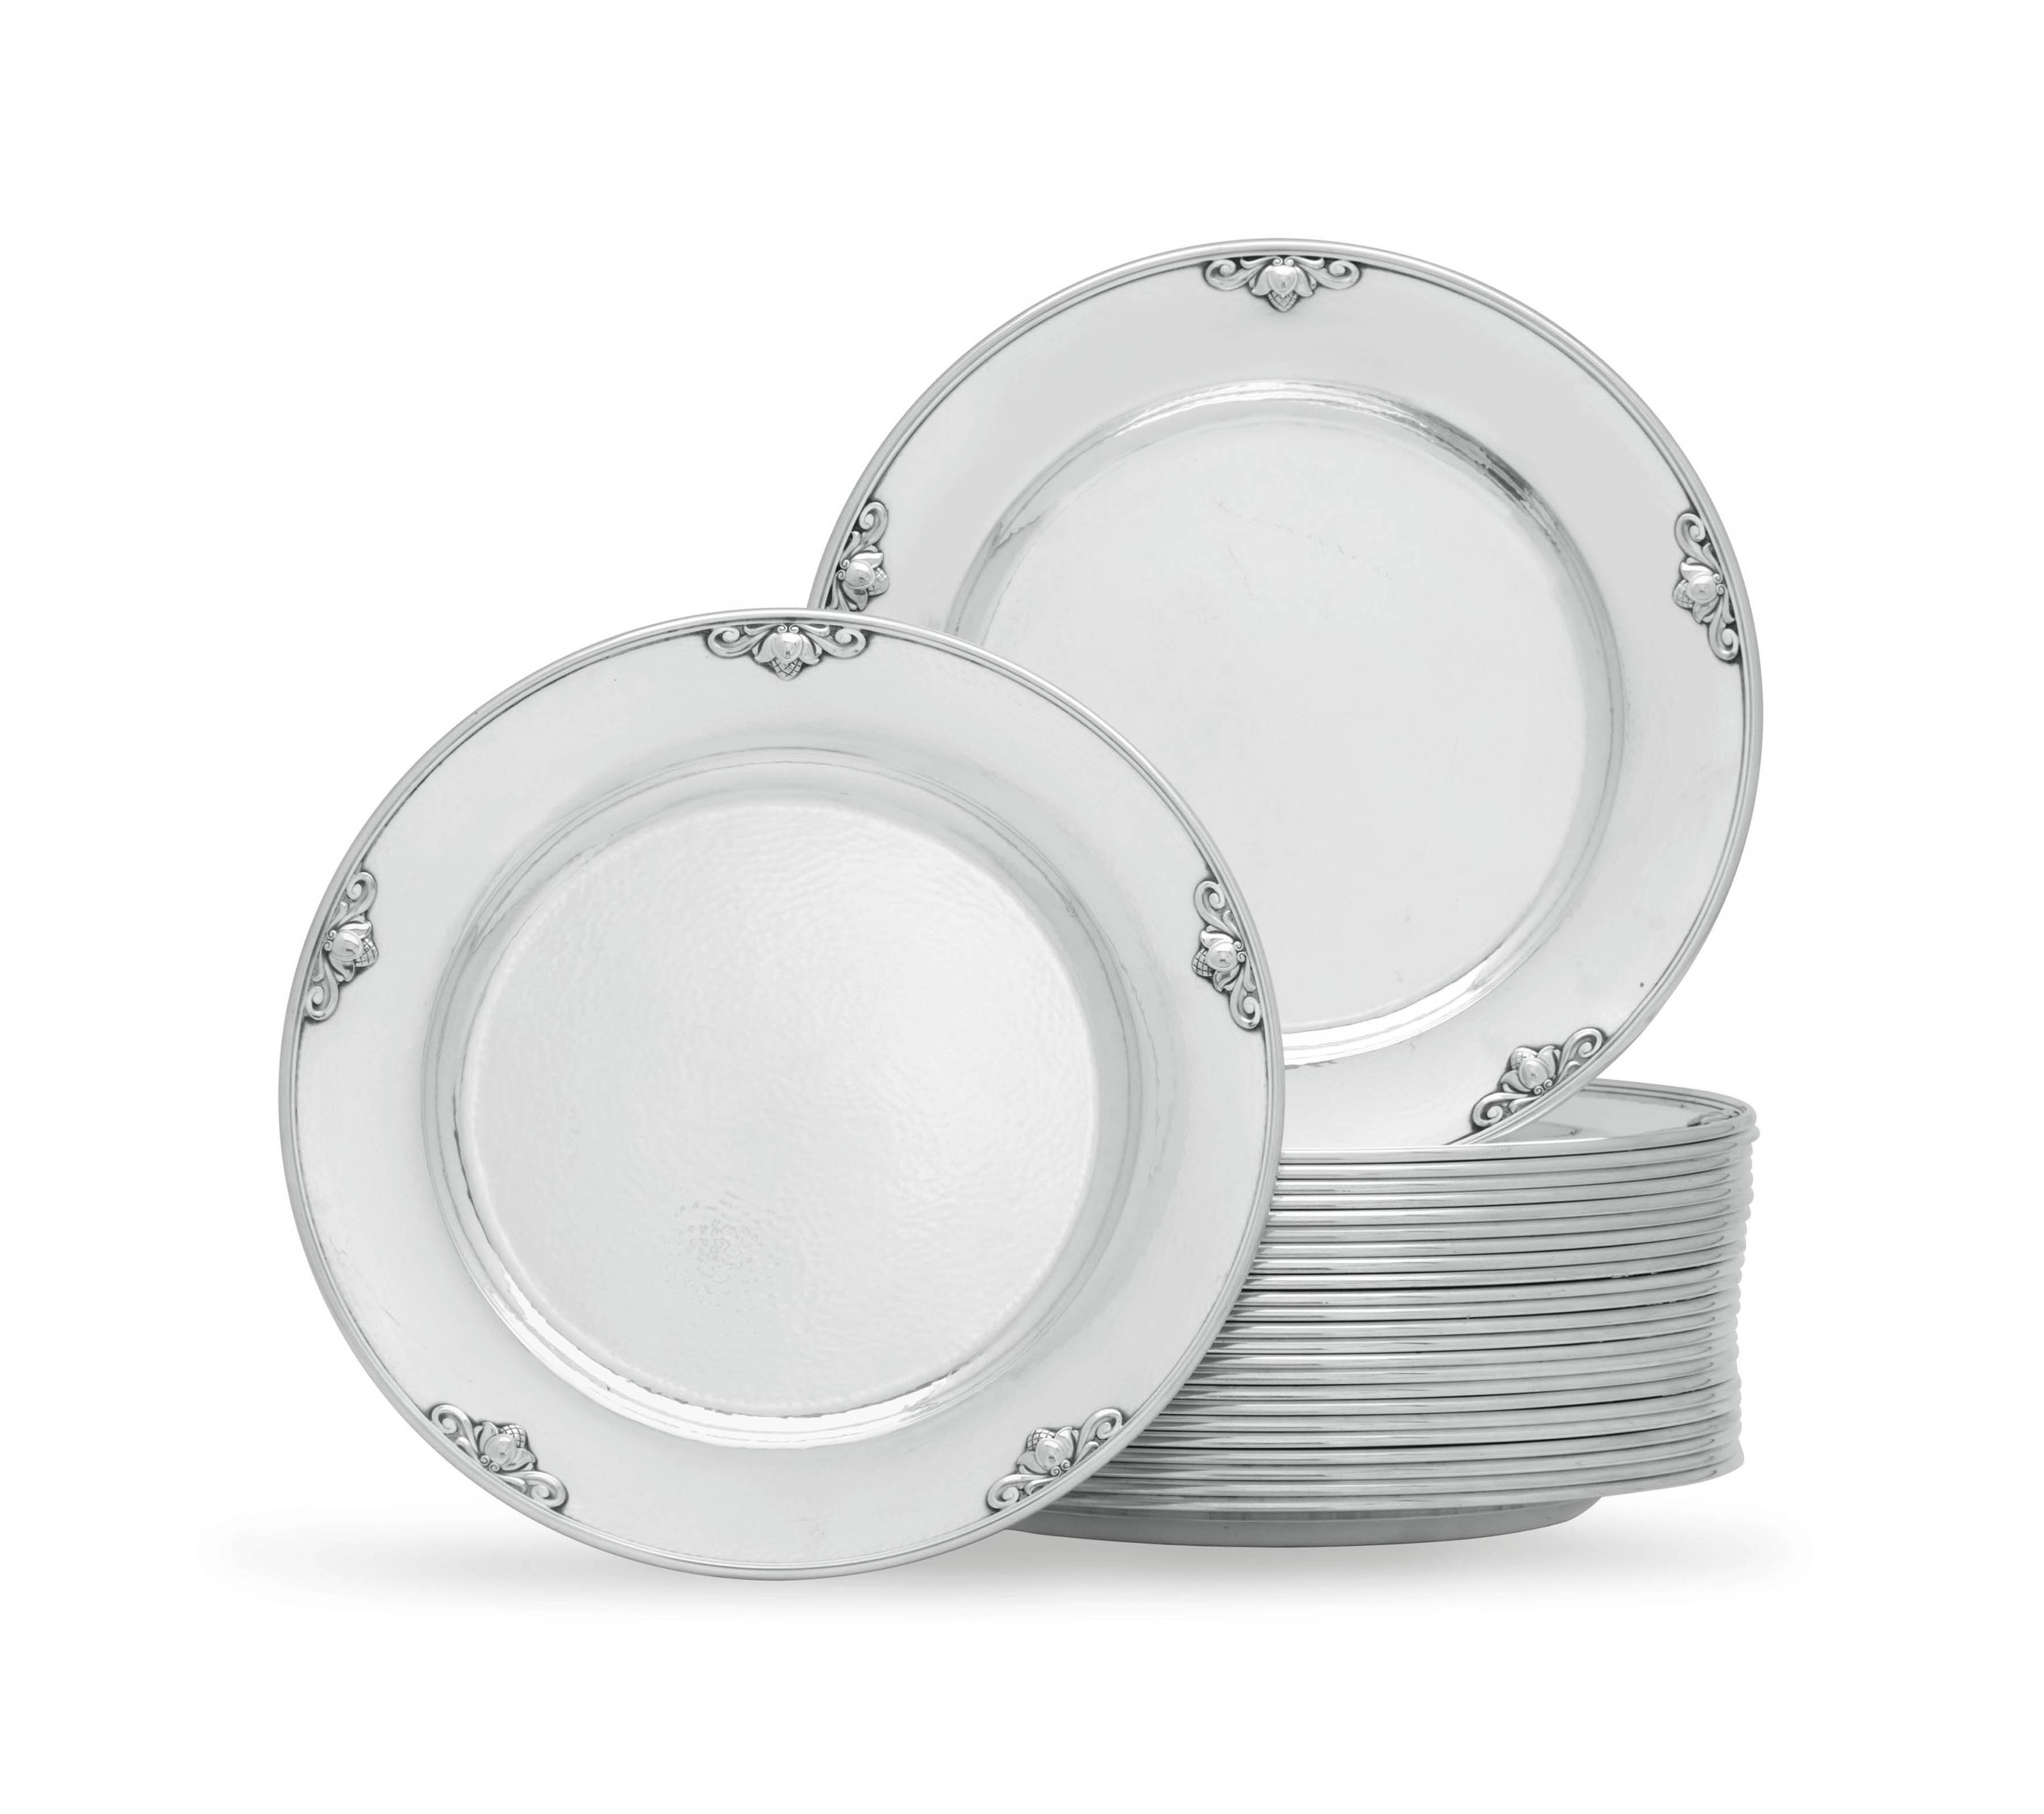 A SET OF TWENTY-FIVE DANISH SILVER DINNER PLATES, DESIGNED BY JOHAN ROHDE